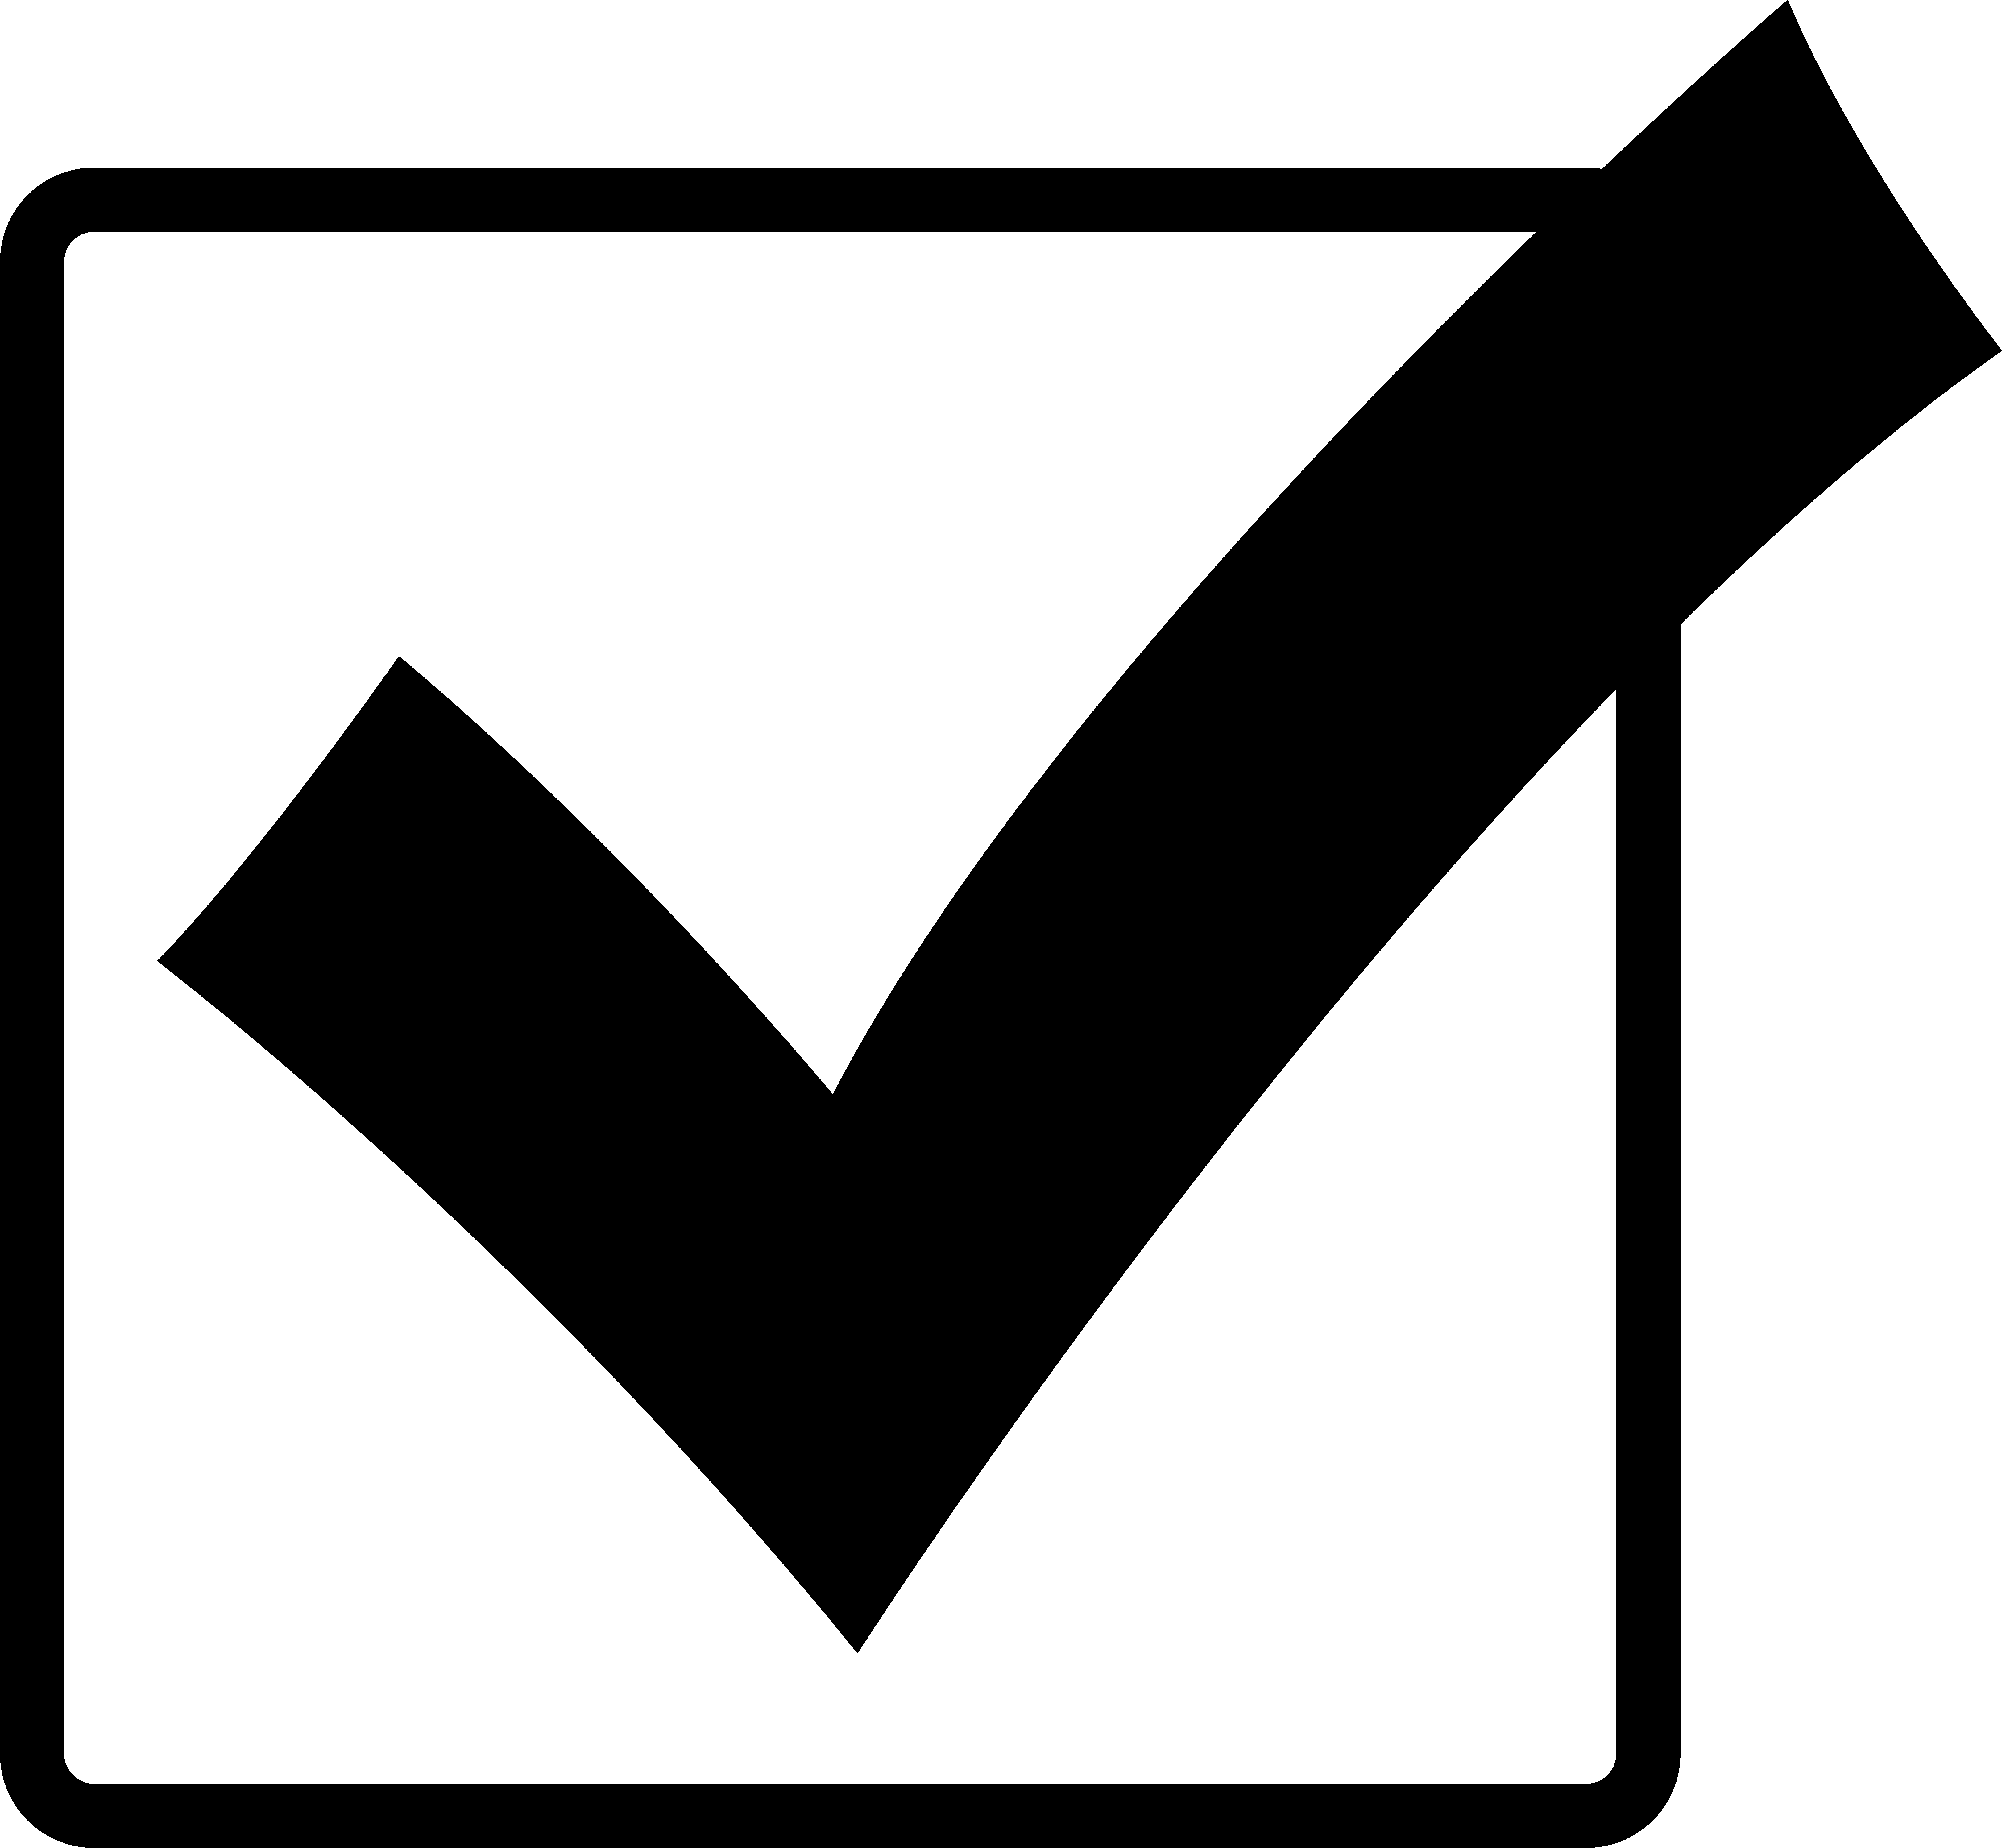 svg freeuse download Check box panda free. Yes clipart ballot